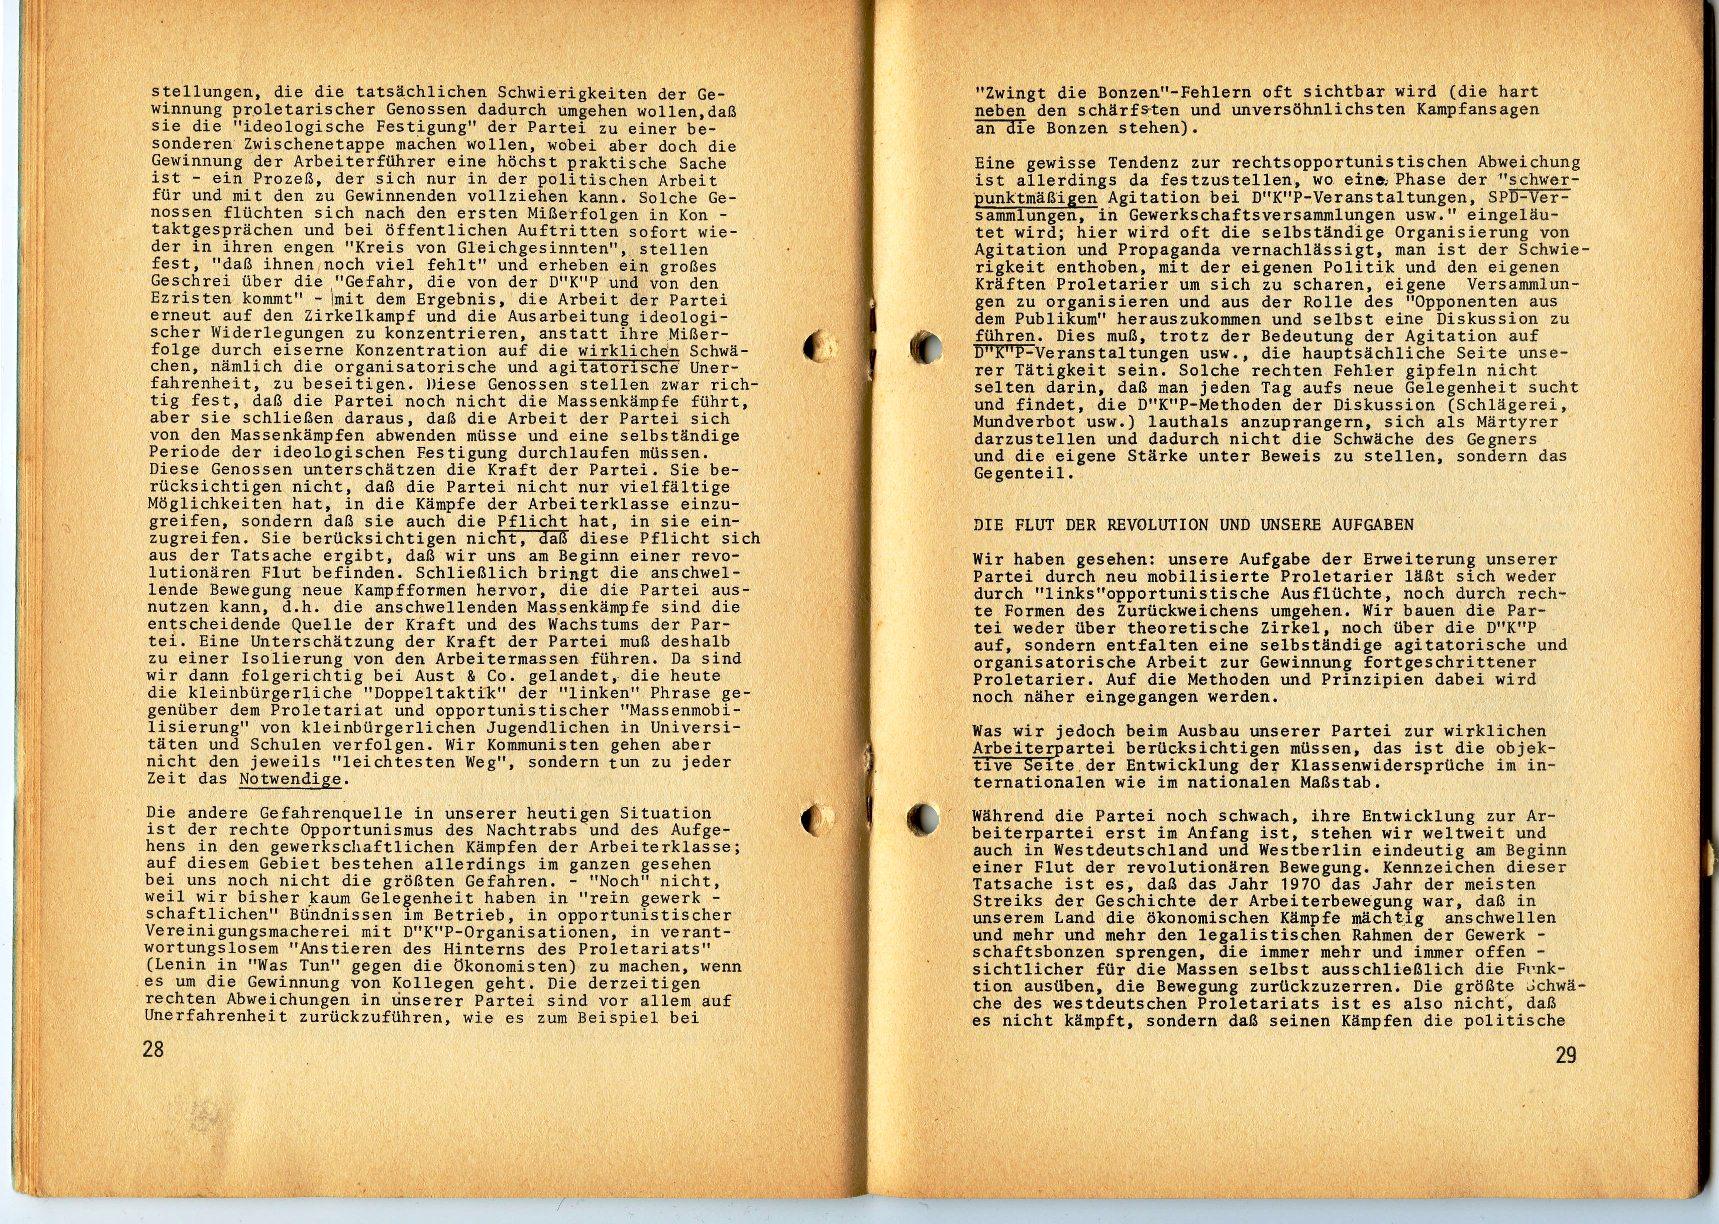 ZB_Parteiarbeiter_1971_04_15